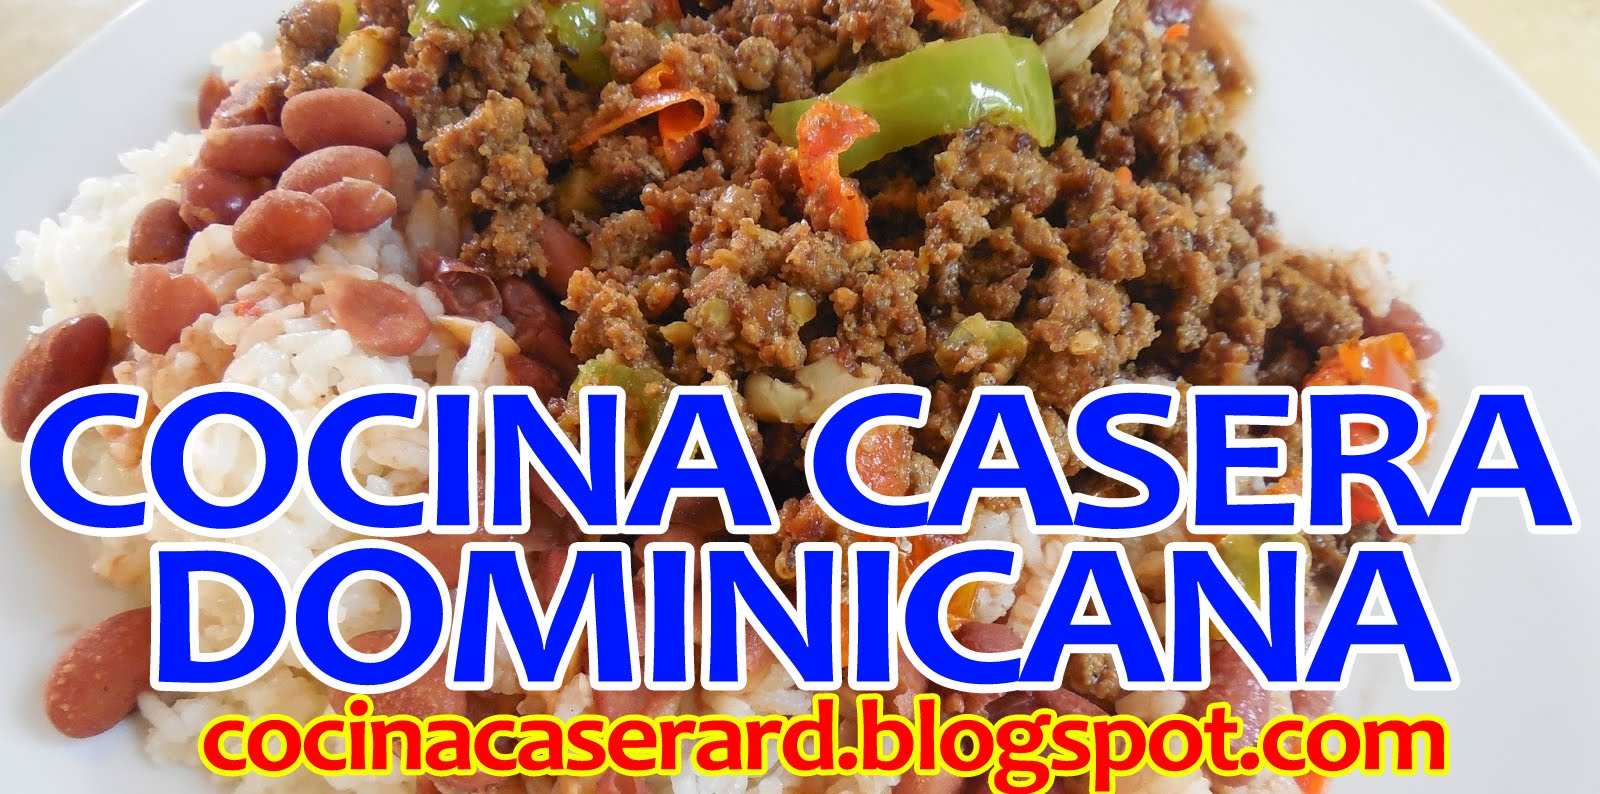 Cocina casera República Dominicana